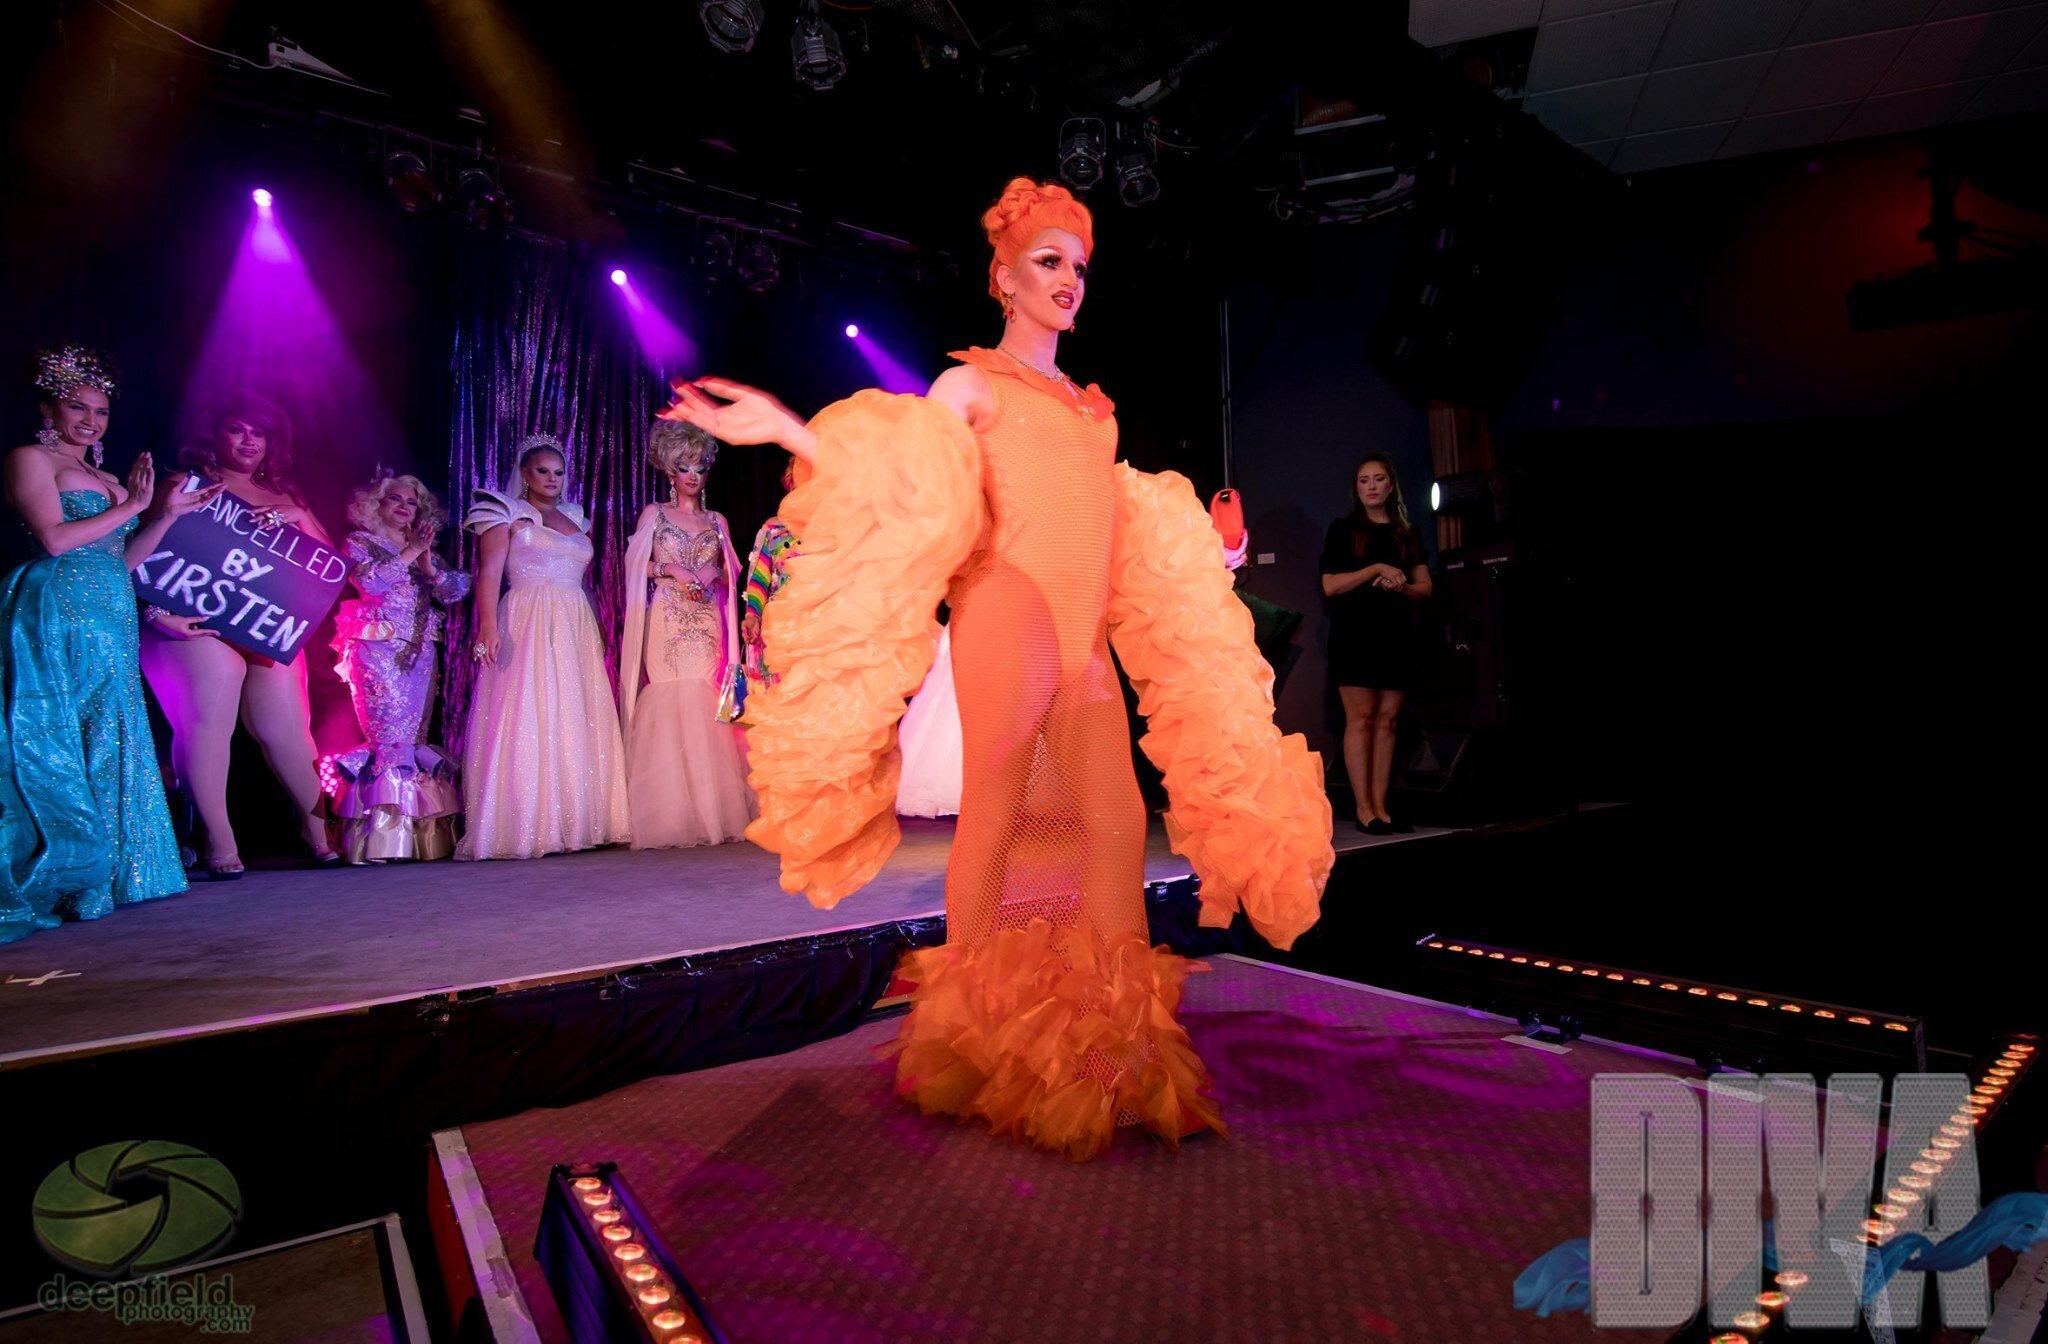 bell-of-the-ball-mynx-moscato-diva-awards-sydney-drag-queen-royalty-best-hire-drag-race-australia.jpg